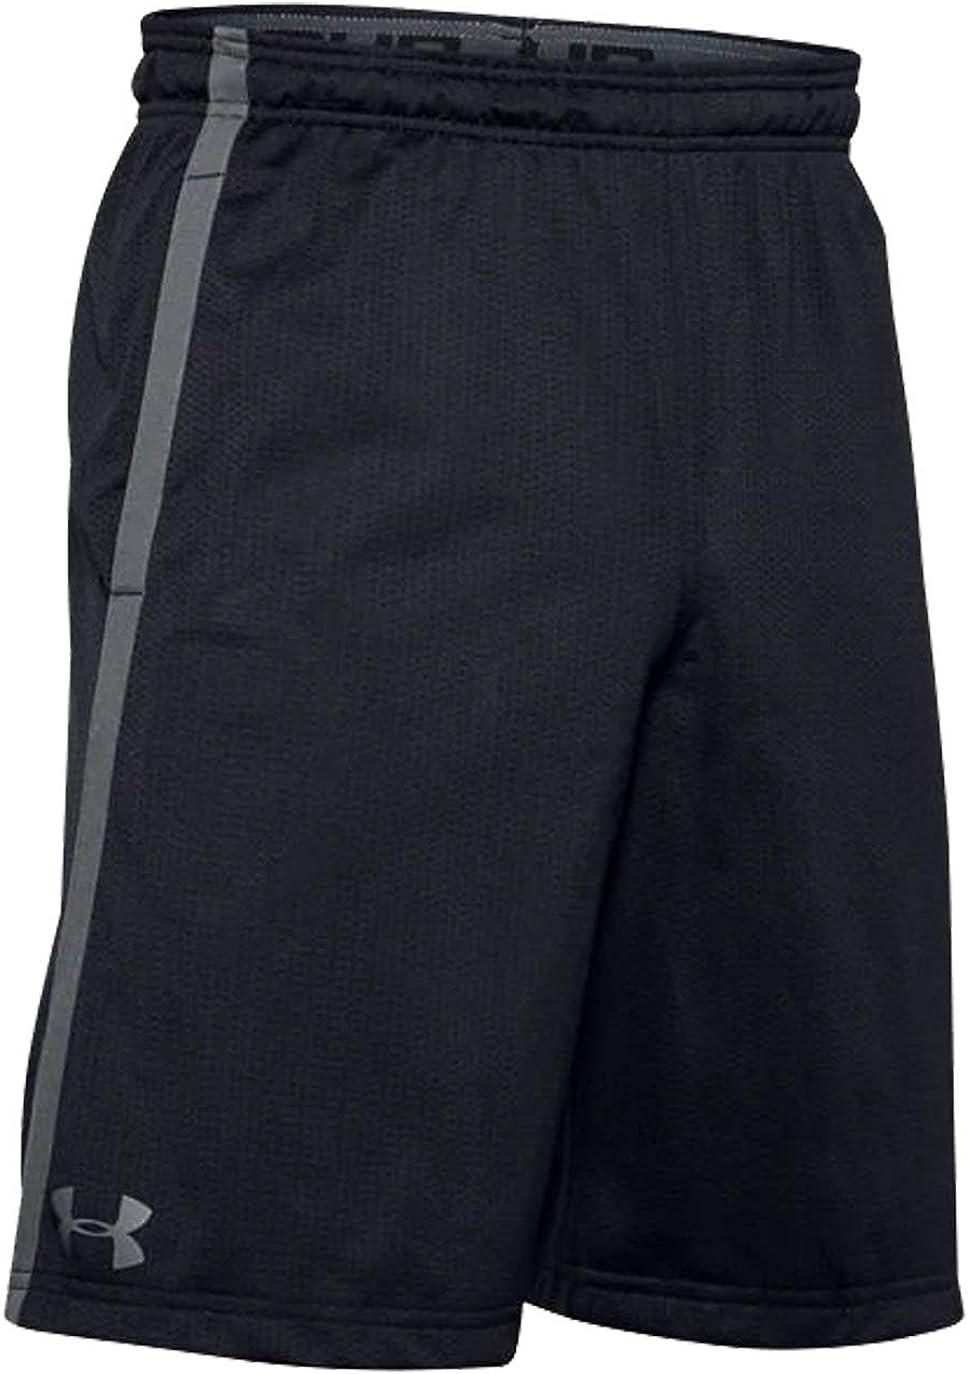 Under Armour Men's UA Tech HeatGear Athletic Mesh Shorts : Clothing, Shoes & Jewelry